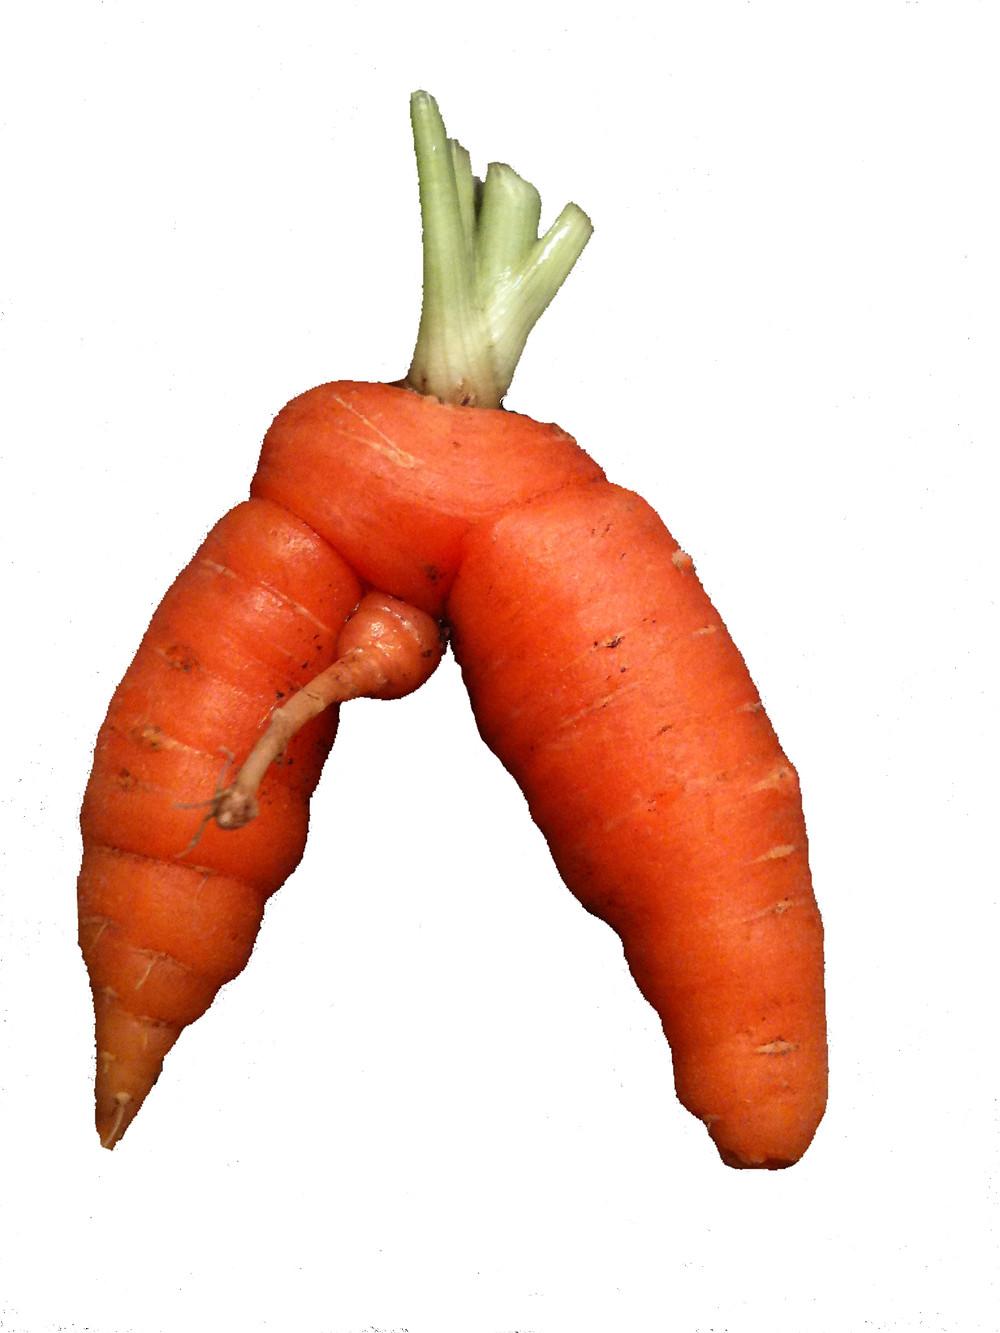 man carrot.jpg